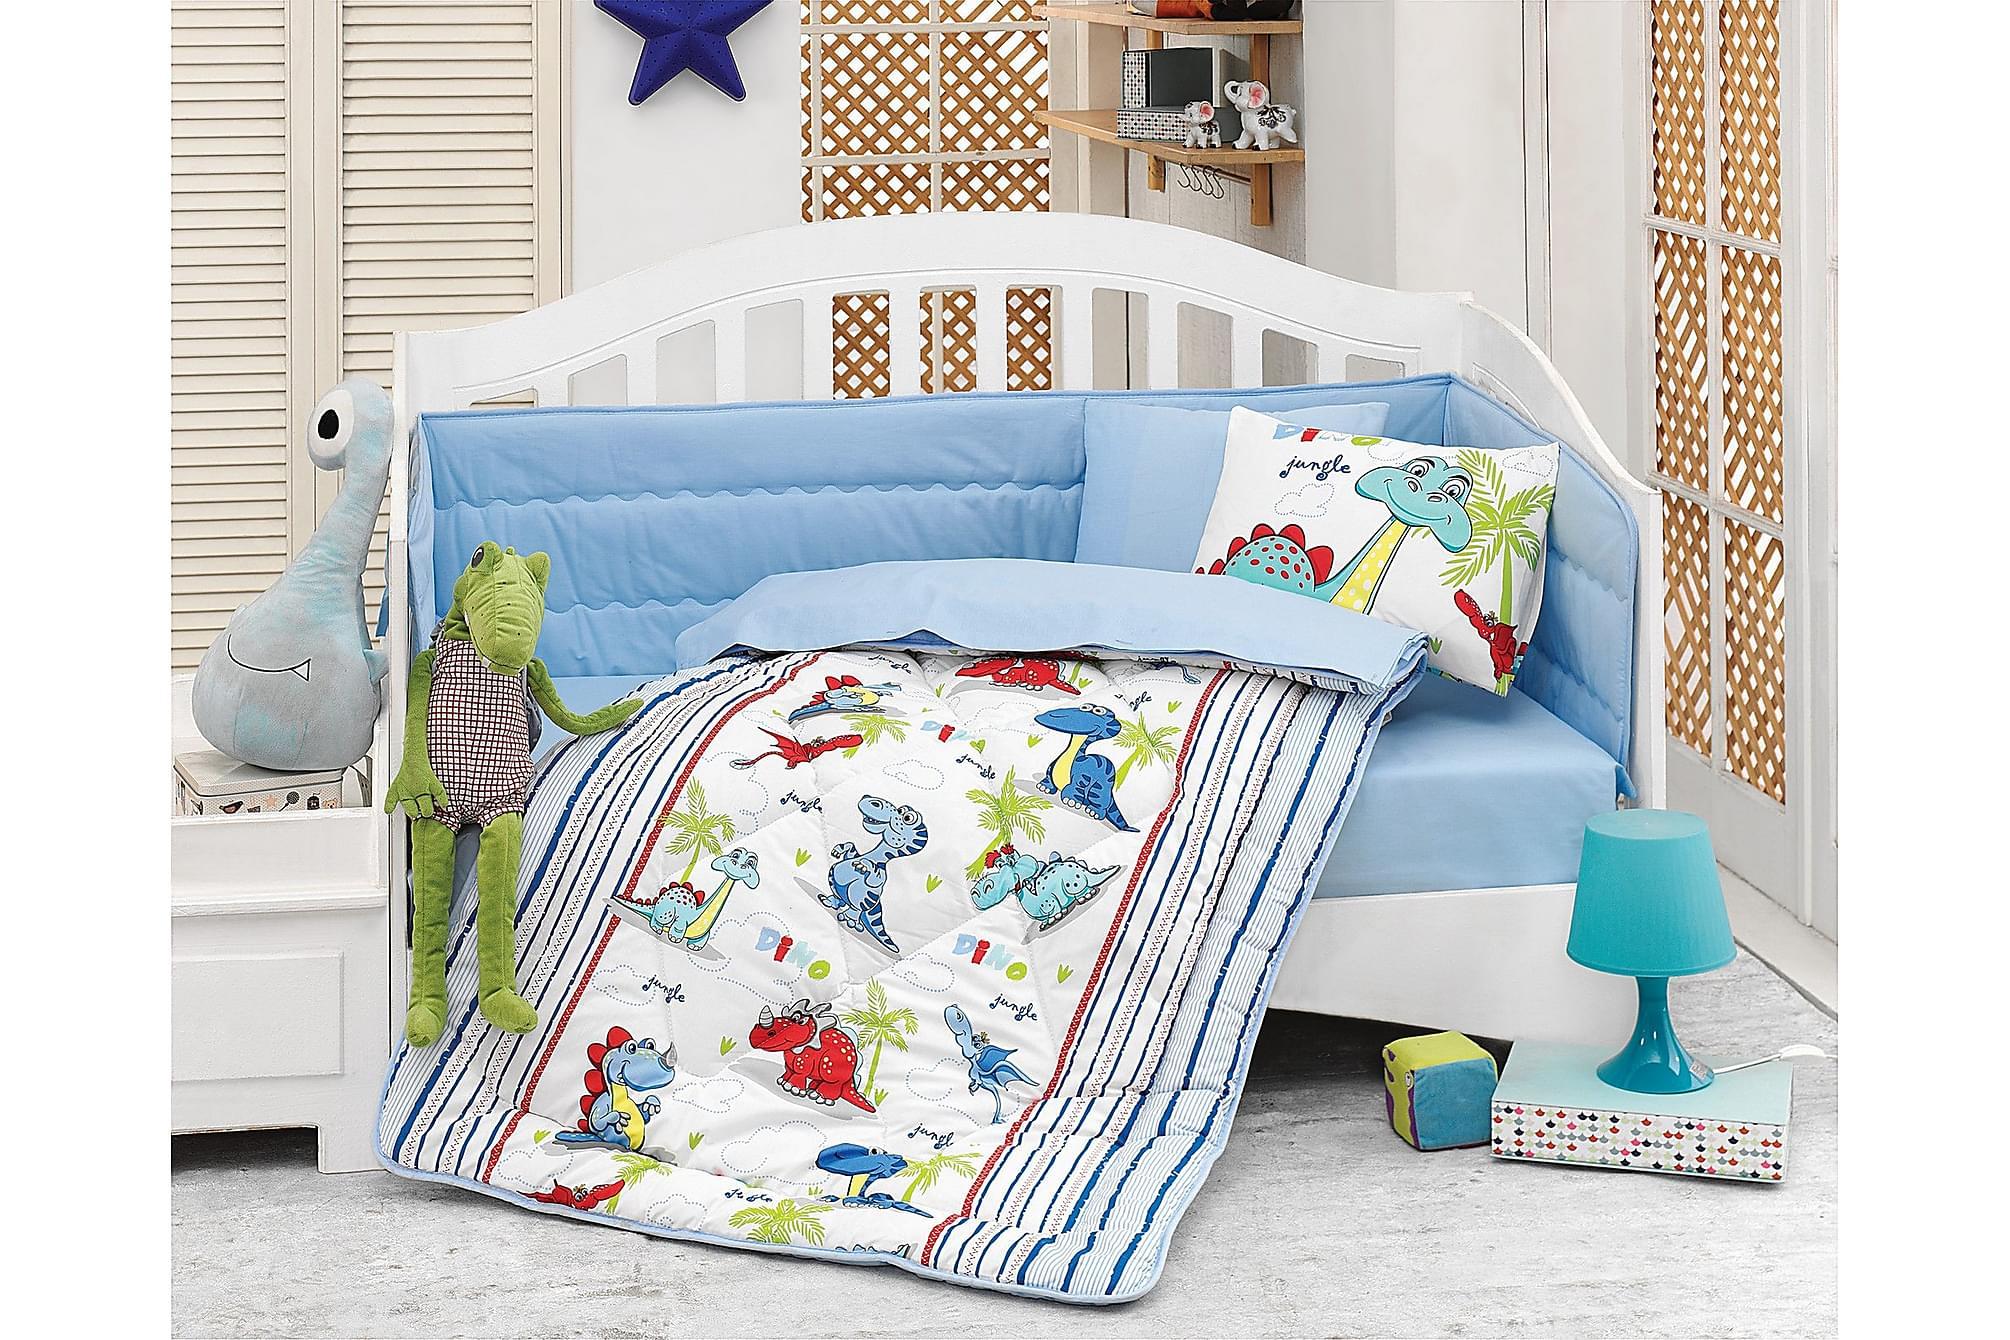 COTTON BOX Sovpaket Baby 6 Delar Ranforce Vit/Blå/Röd/Grön